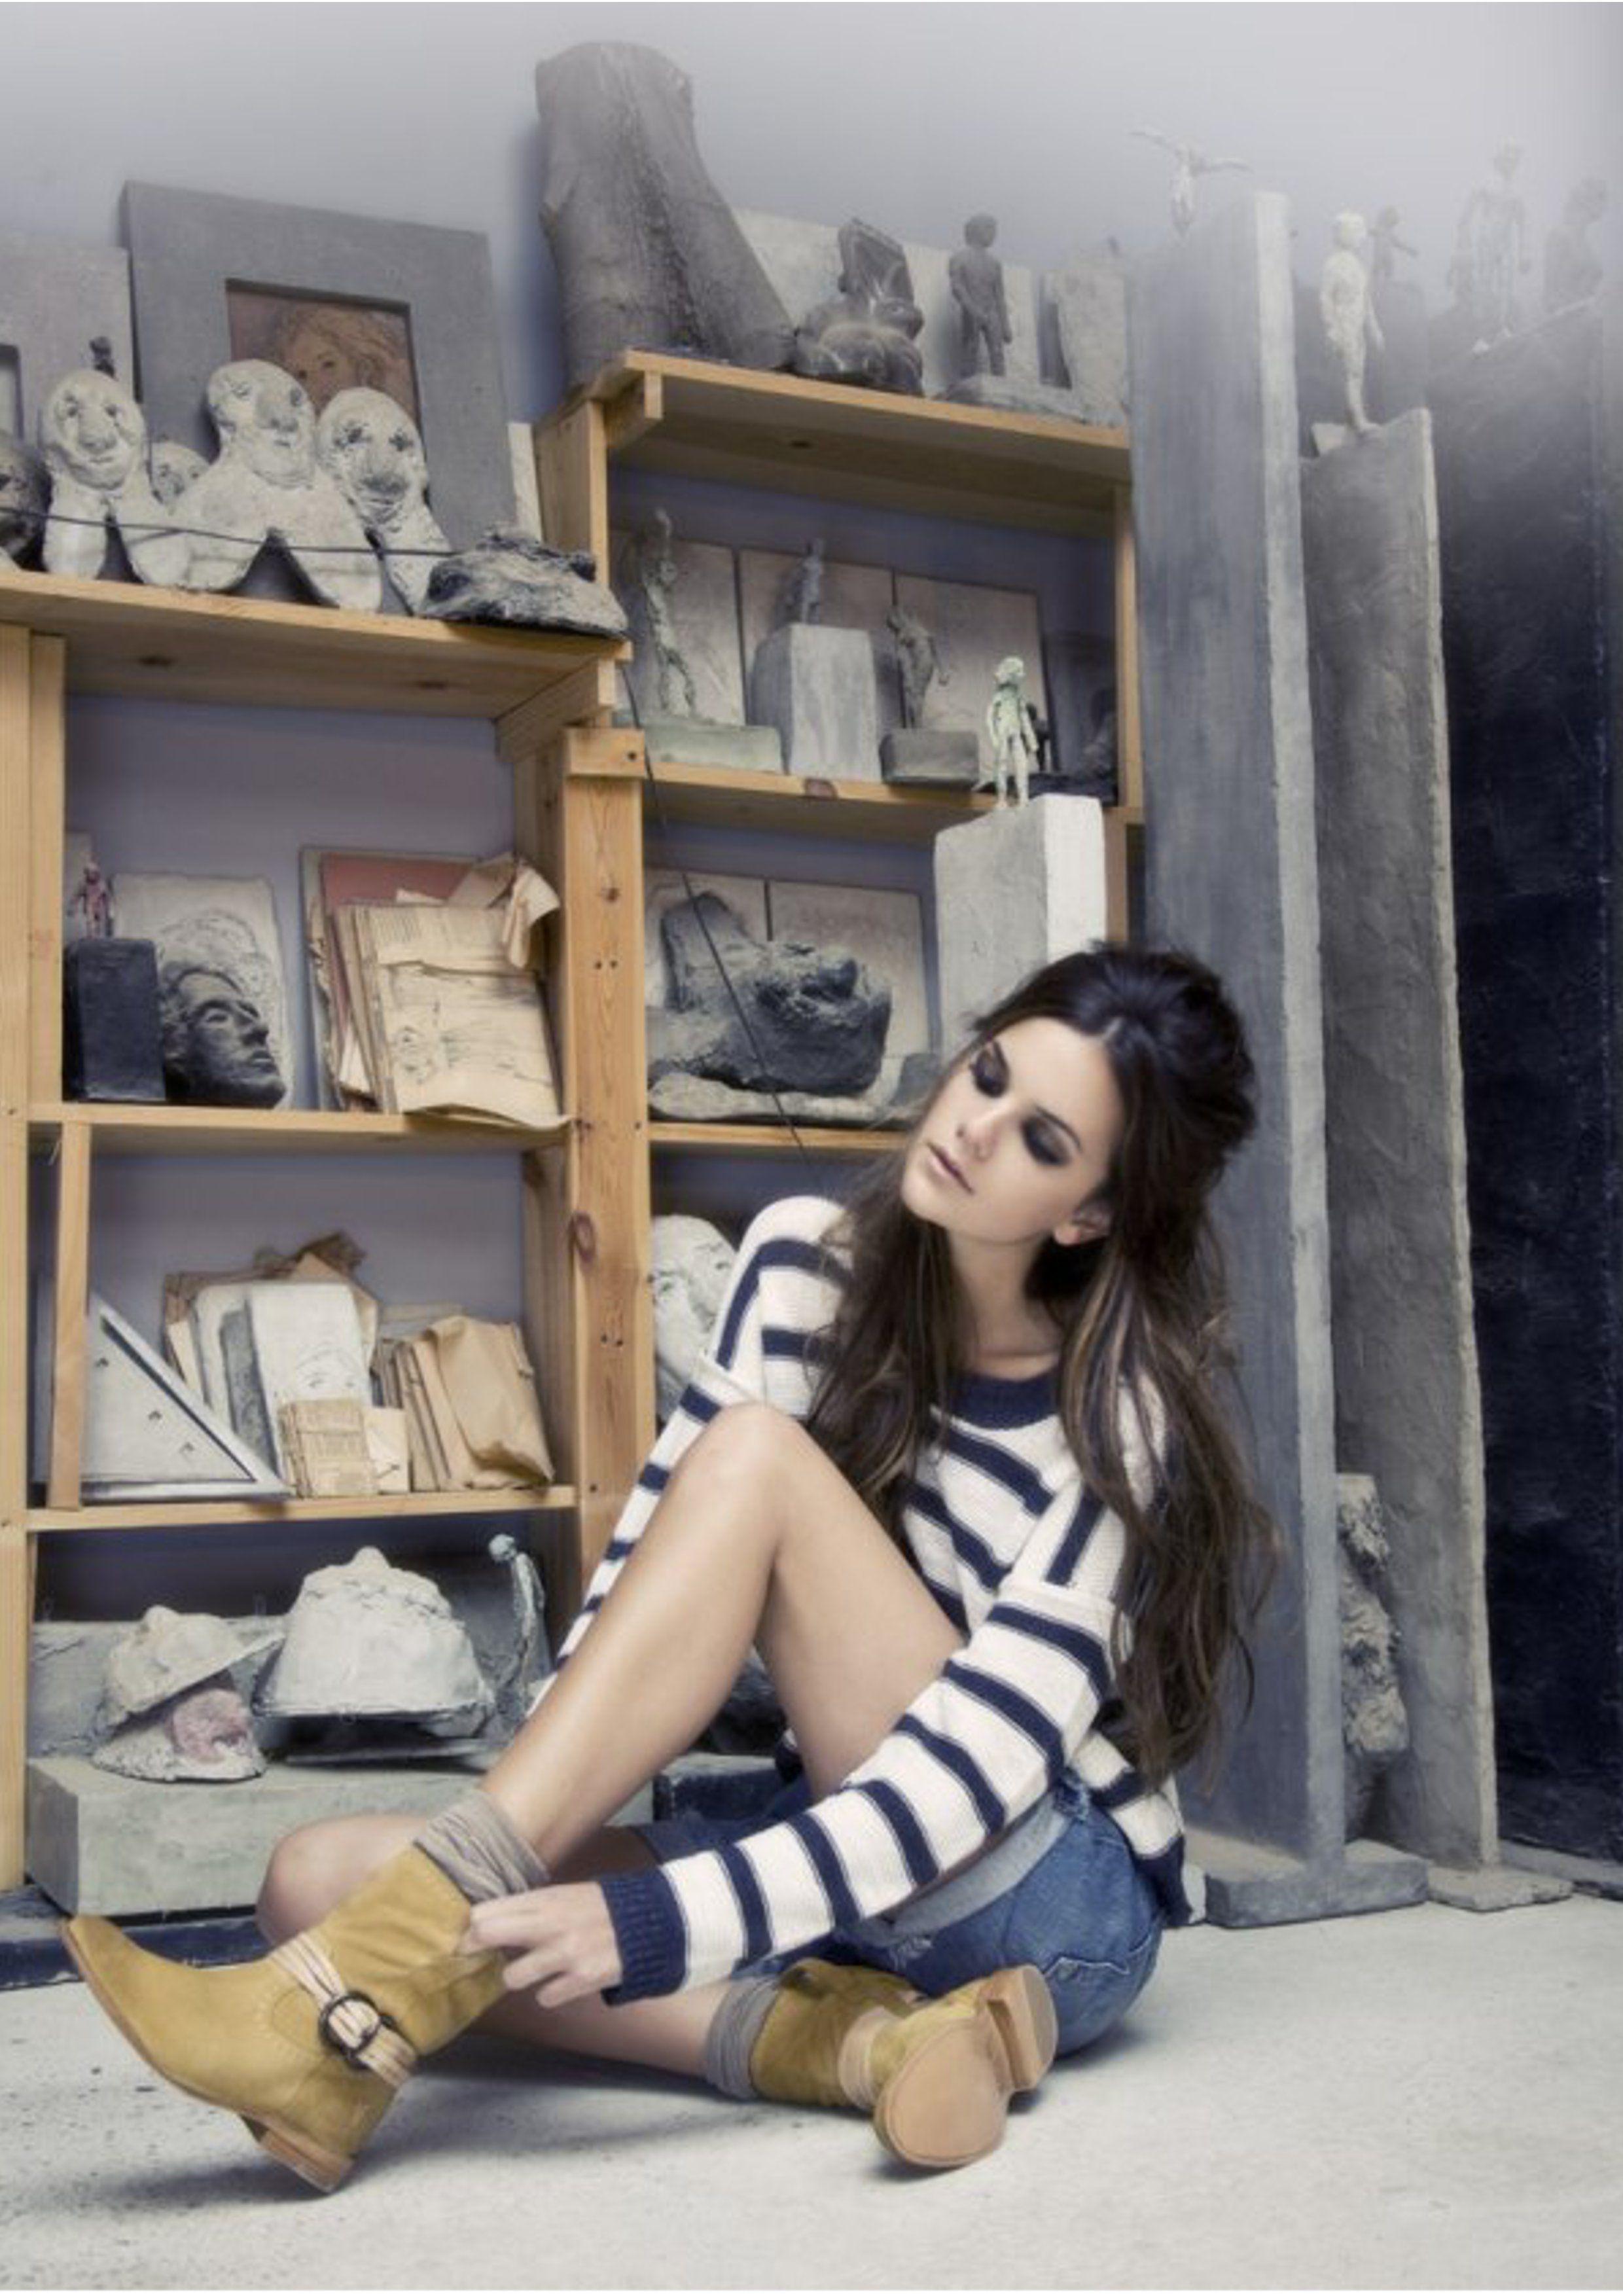 Pin by Kaela Graber on Fashion: Women | Fashion, Style ...